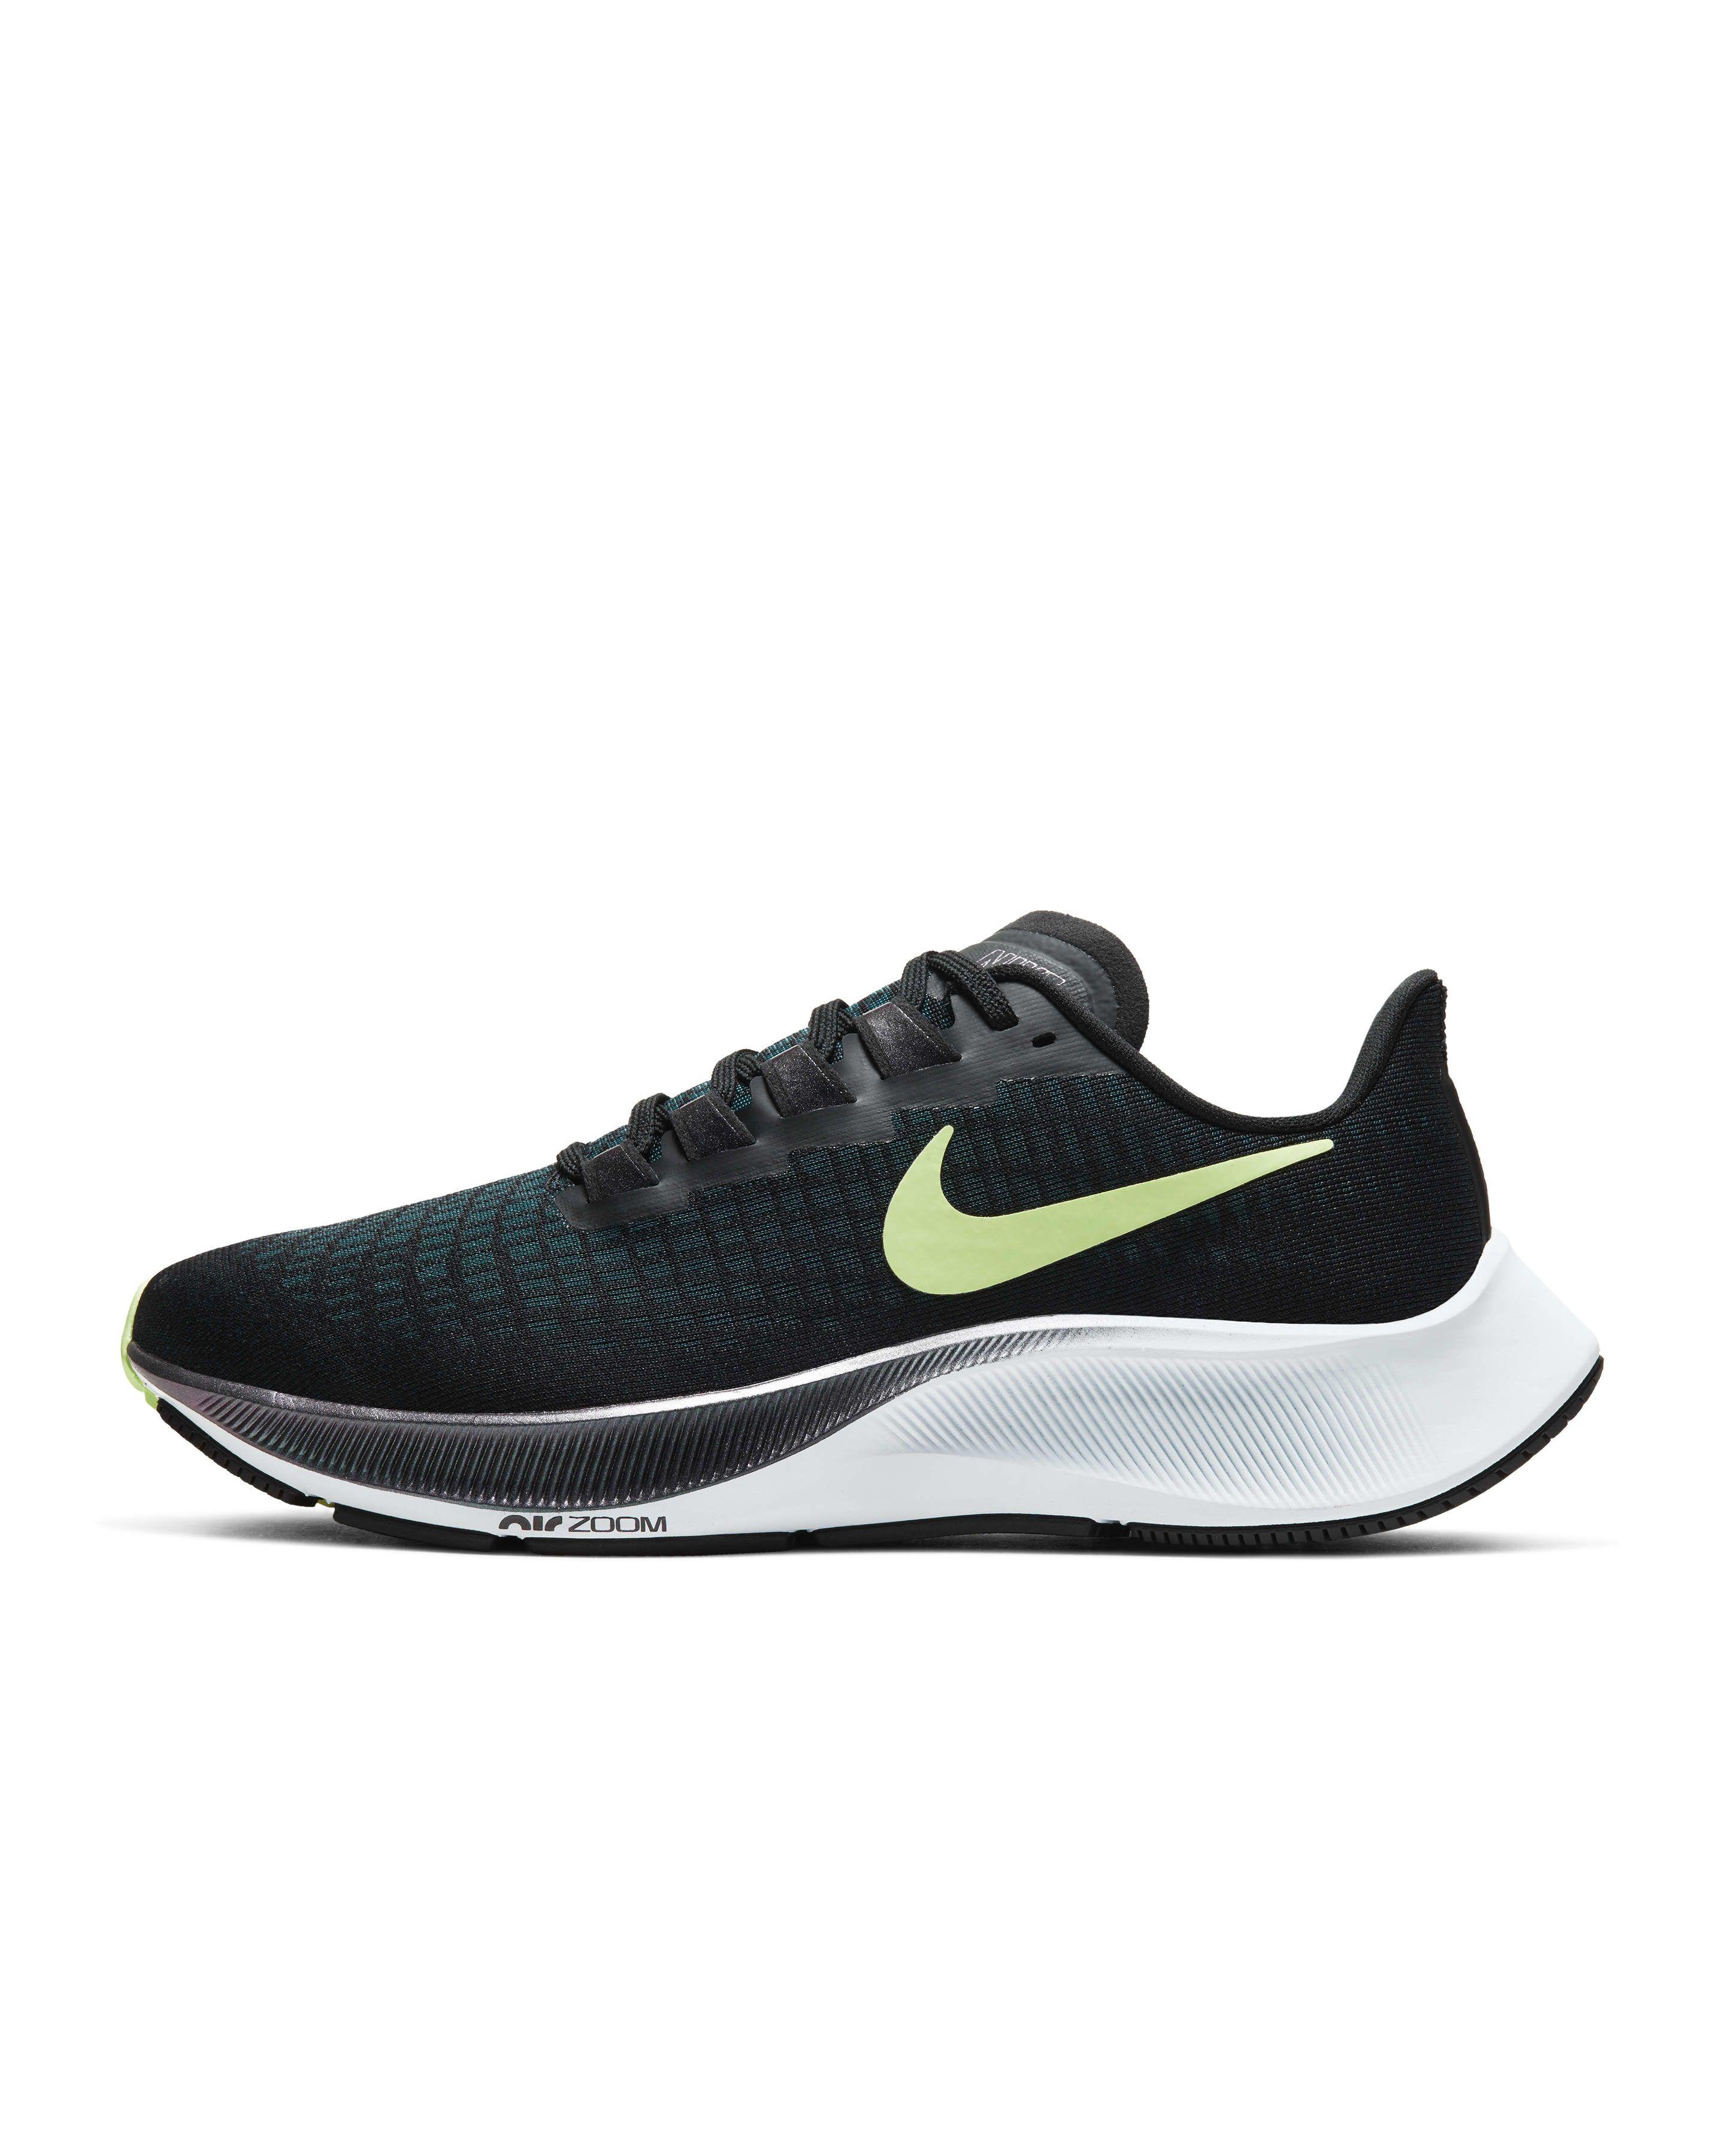 Nike Air Zoom Pegasus 37 Review | Nike Running Shoes